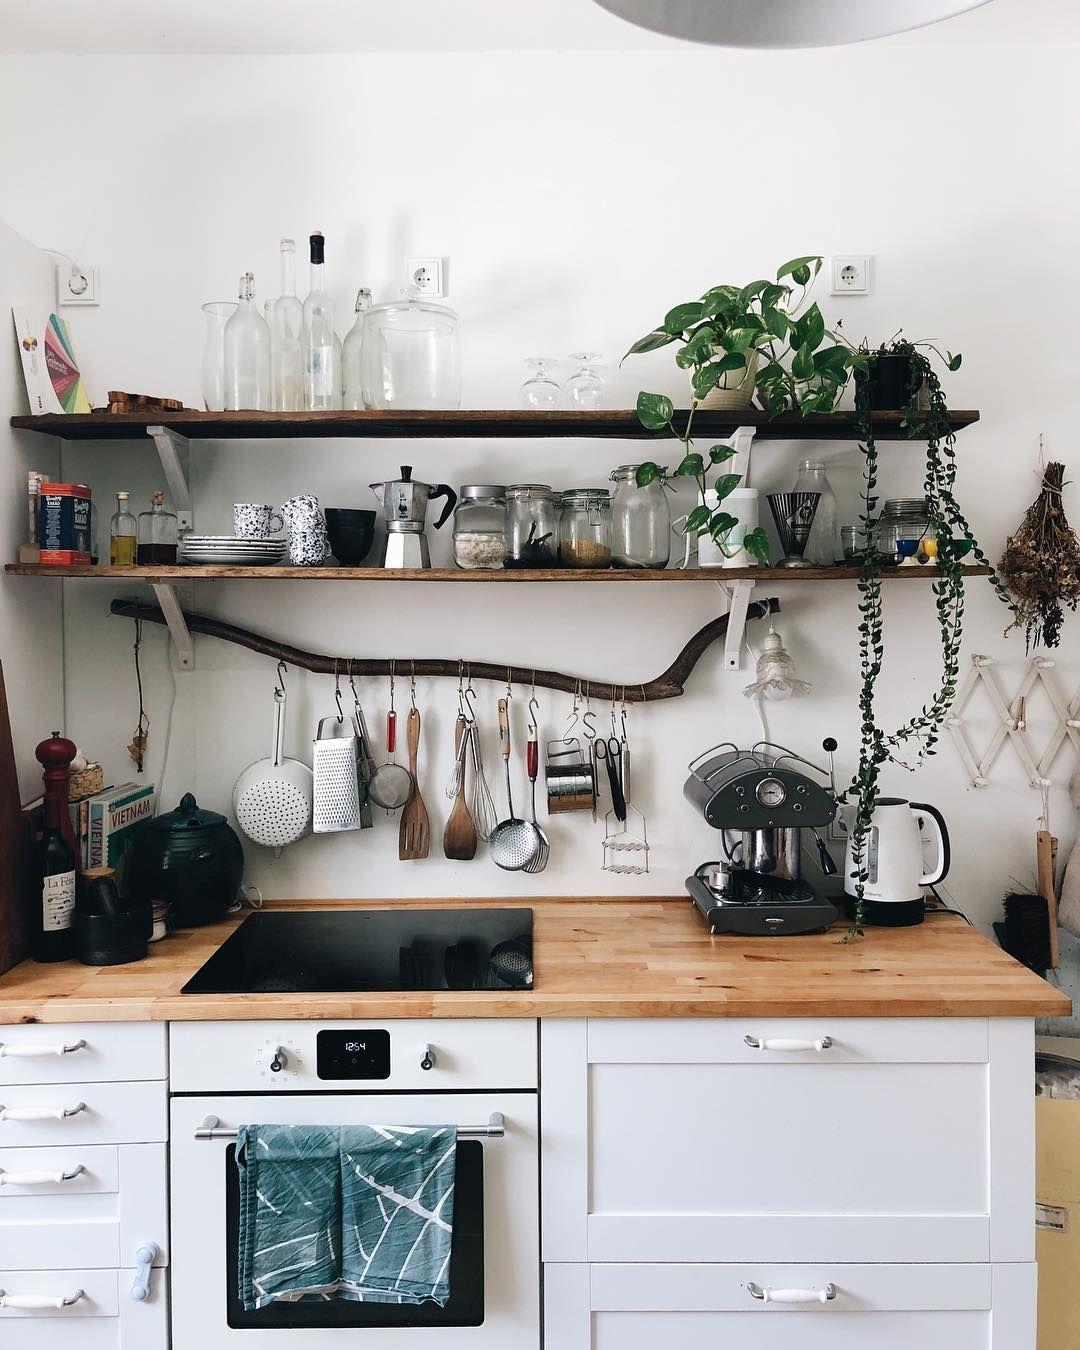 "Photo of AMAZEDMAG | Milena Heißerer on Instagram: ""Kitchen love at @kerstinskopf 💕 Homestory now on amazed!"""